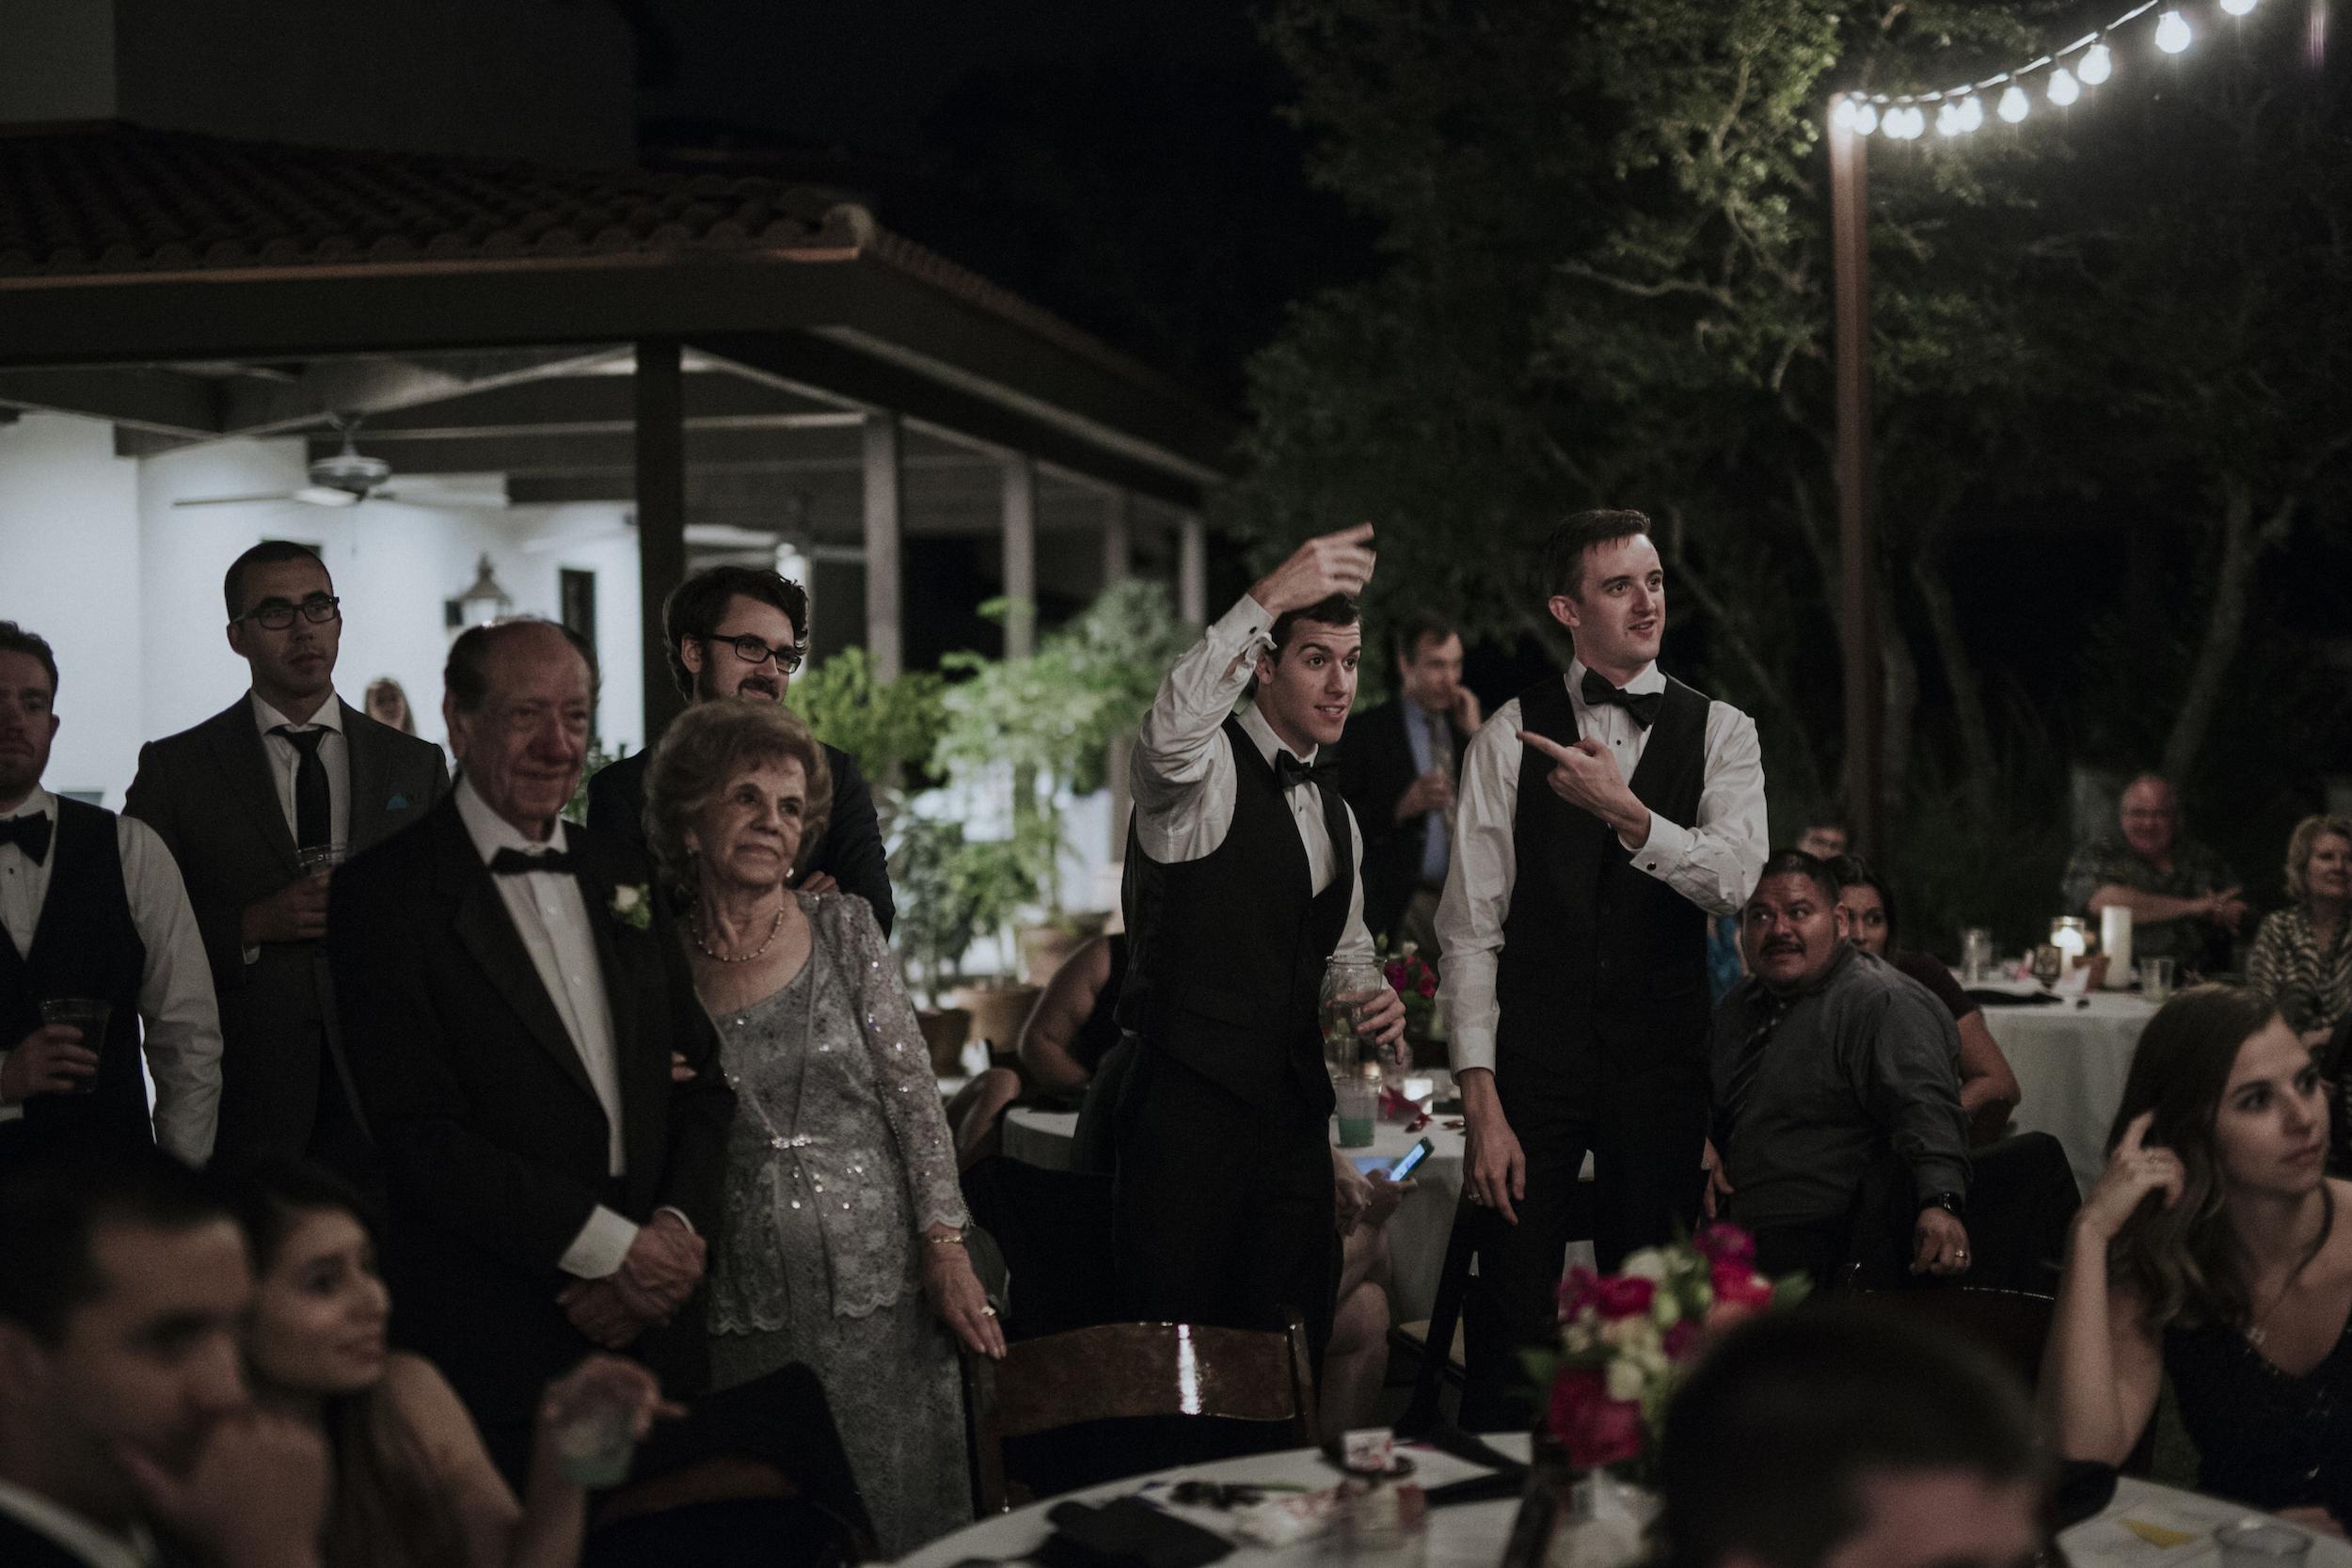 Garden Grove Wedding & Event Center5753.JPG